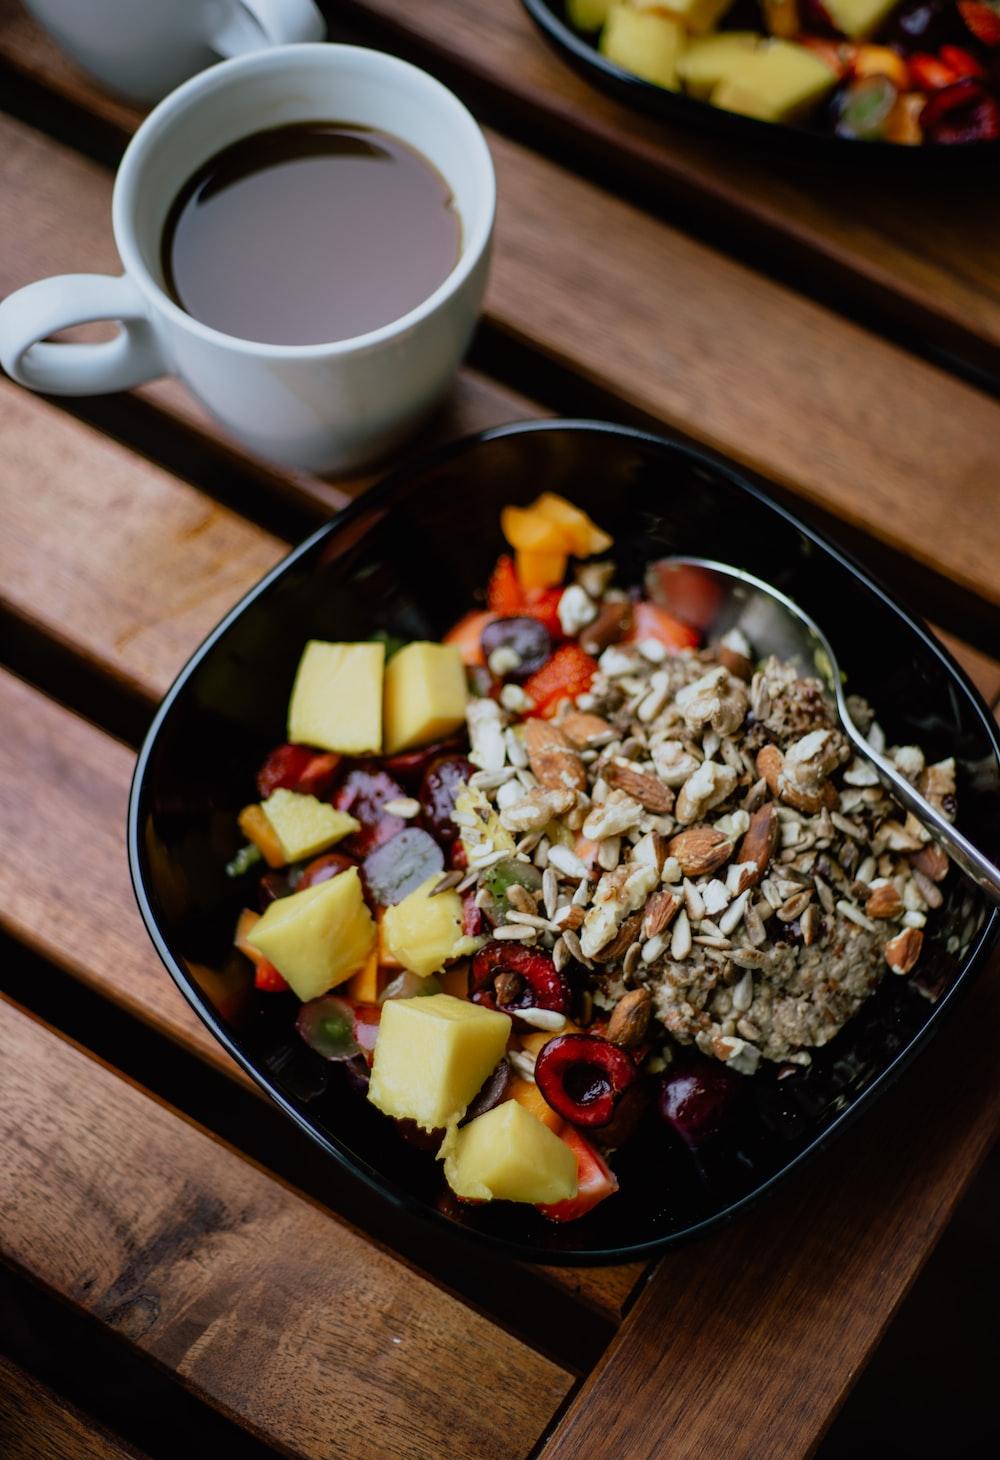 ceramic bowl beside white ceramic mug